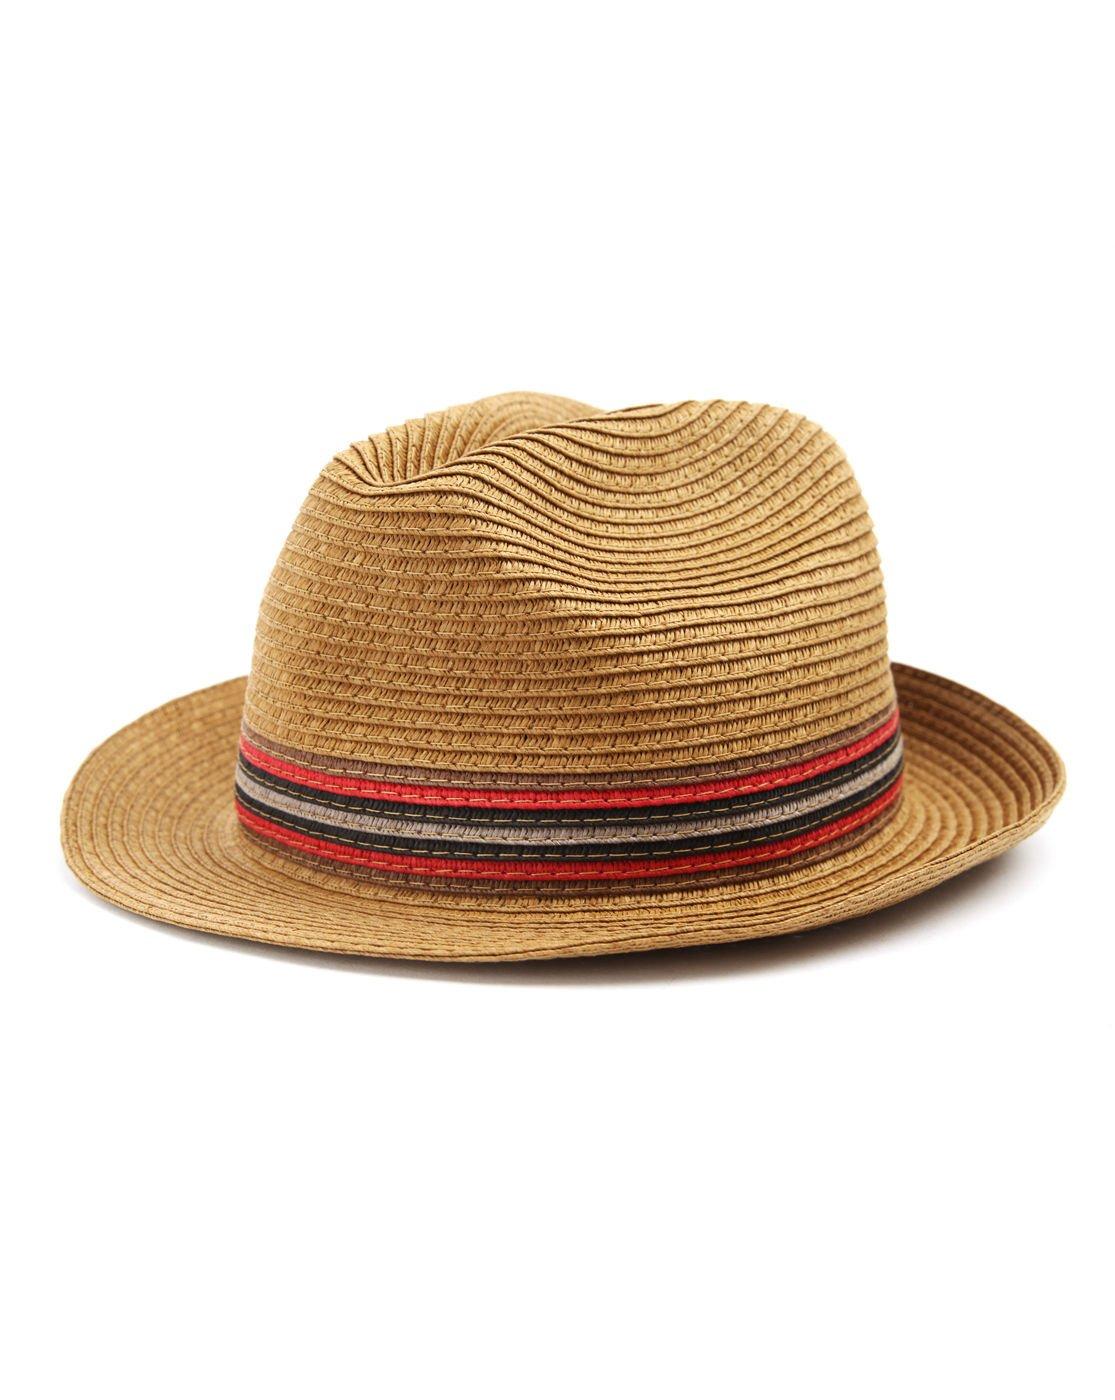 4b7013d11d5746 Ted Baker Hats - Men - Beige Straw Hat - S|M: Amazon.co.uk: Sports &  Outdoors